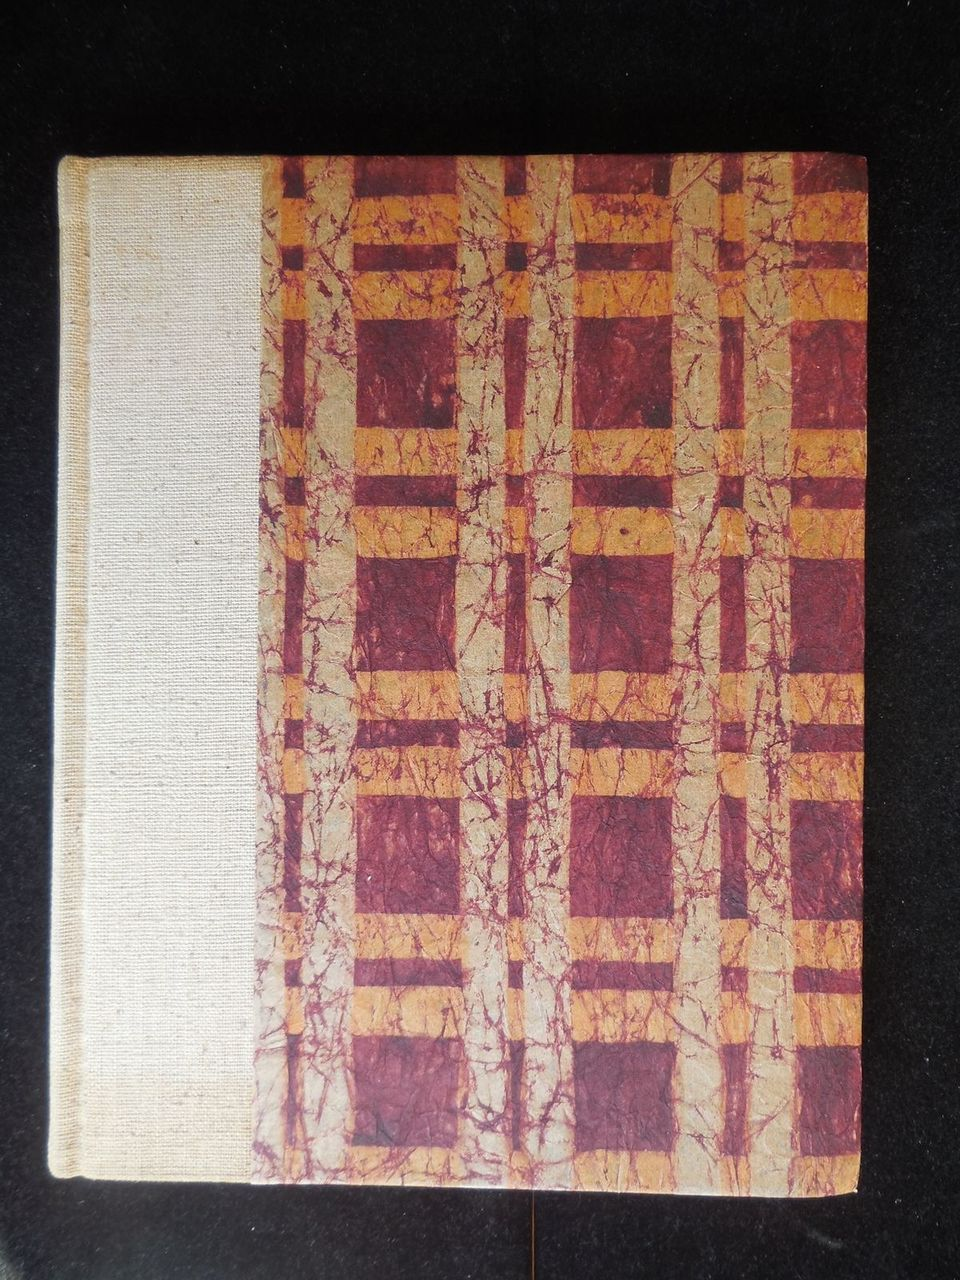 OMAI First Polynesian Ambassador to England, by Thomas Clark - 1940 [Ltd Ed]